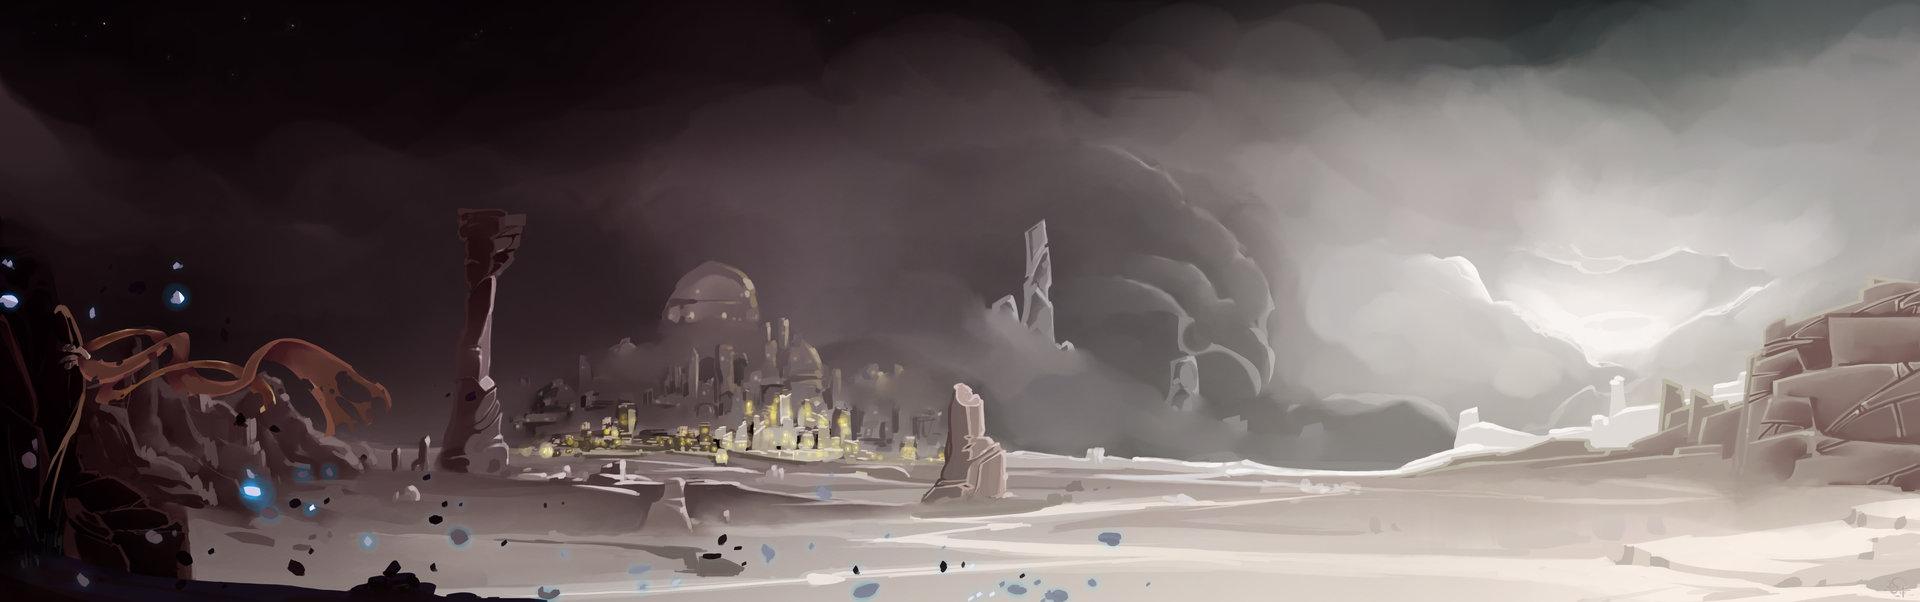 Etienne beschet desertic land